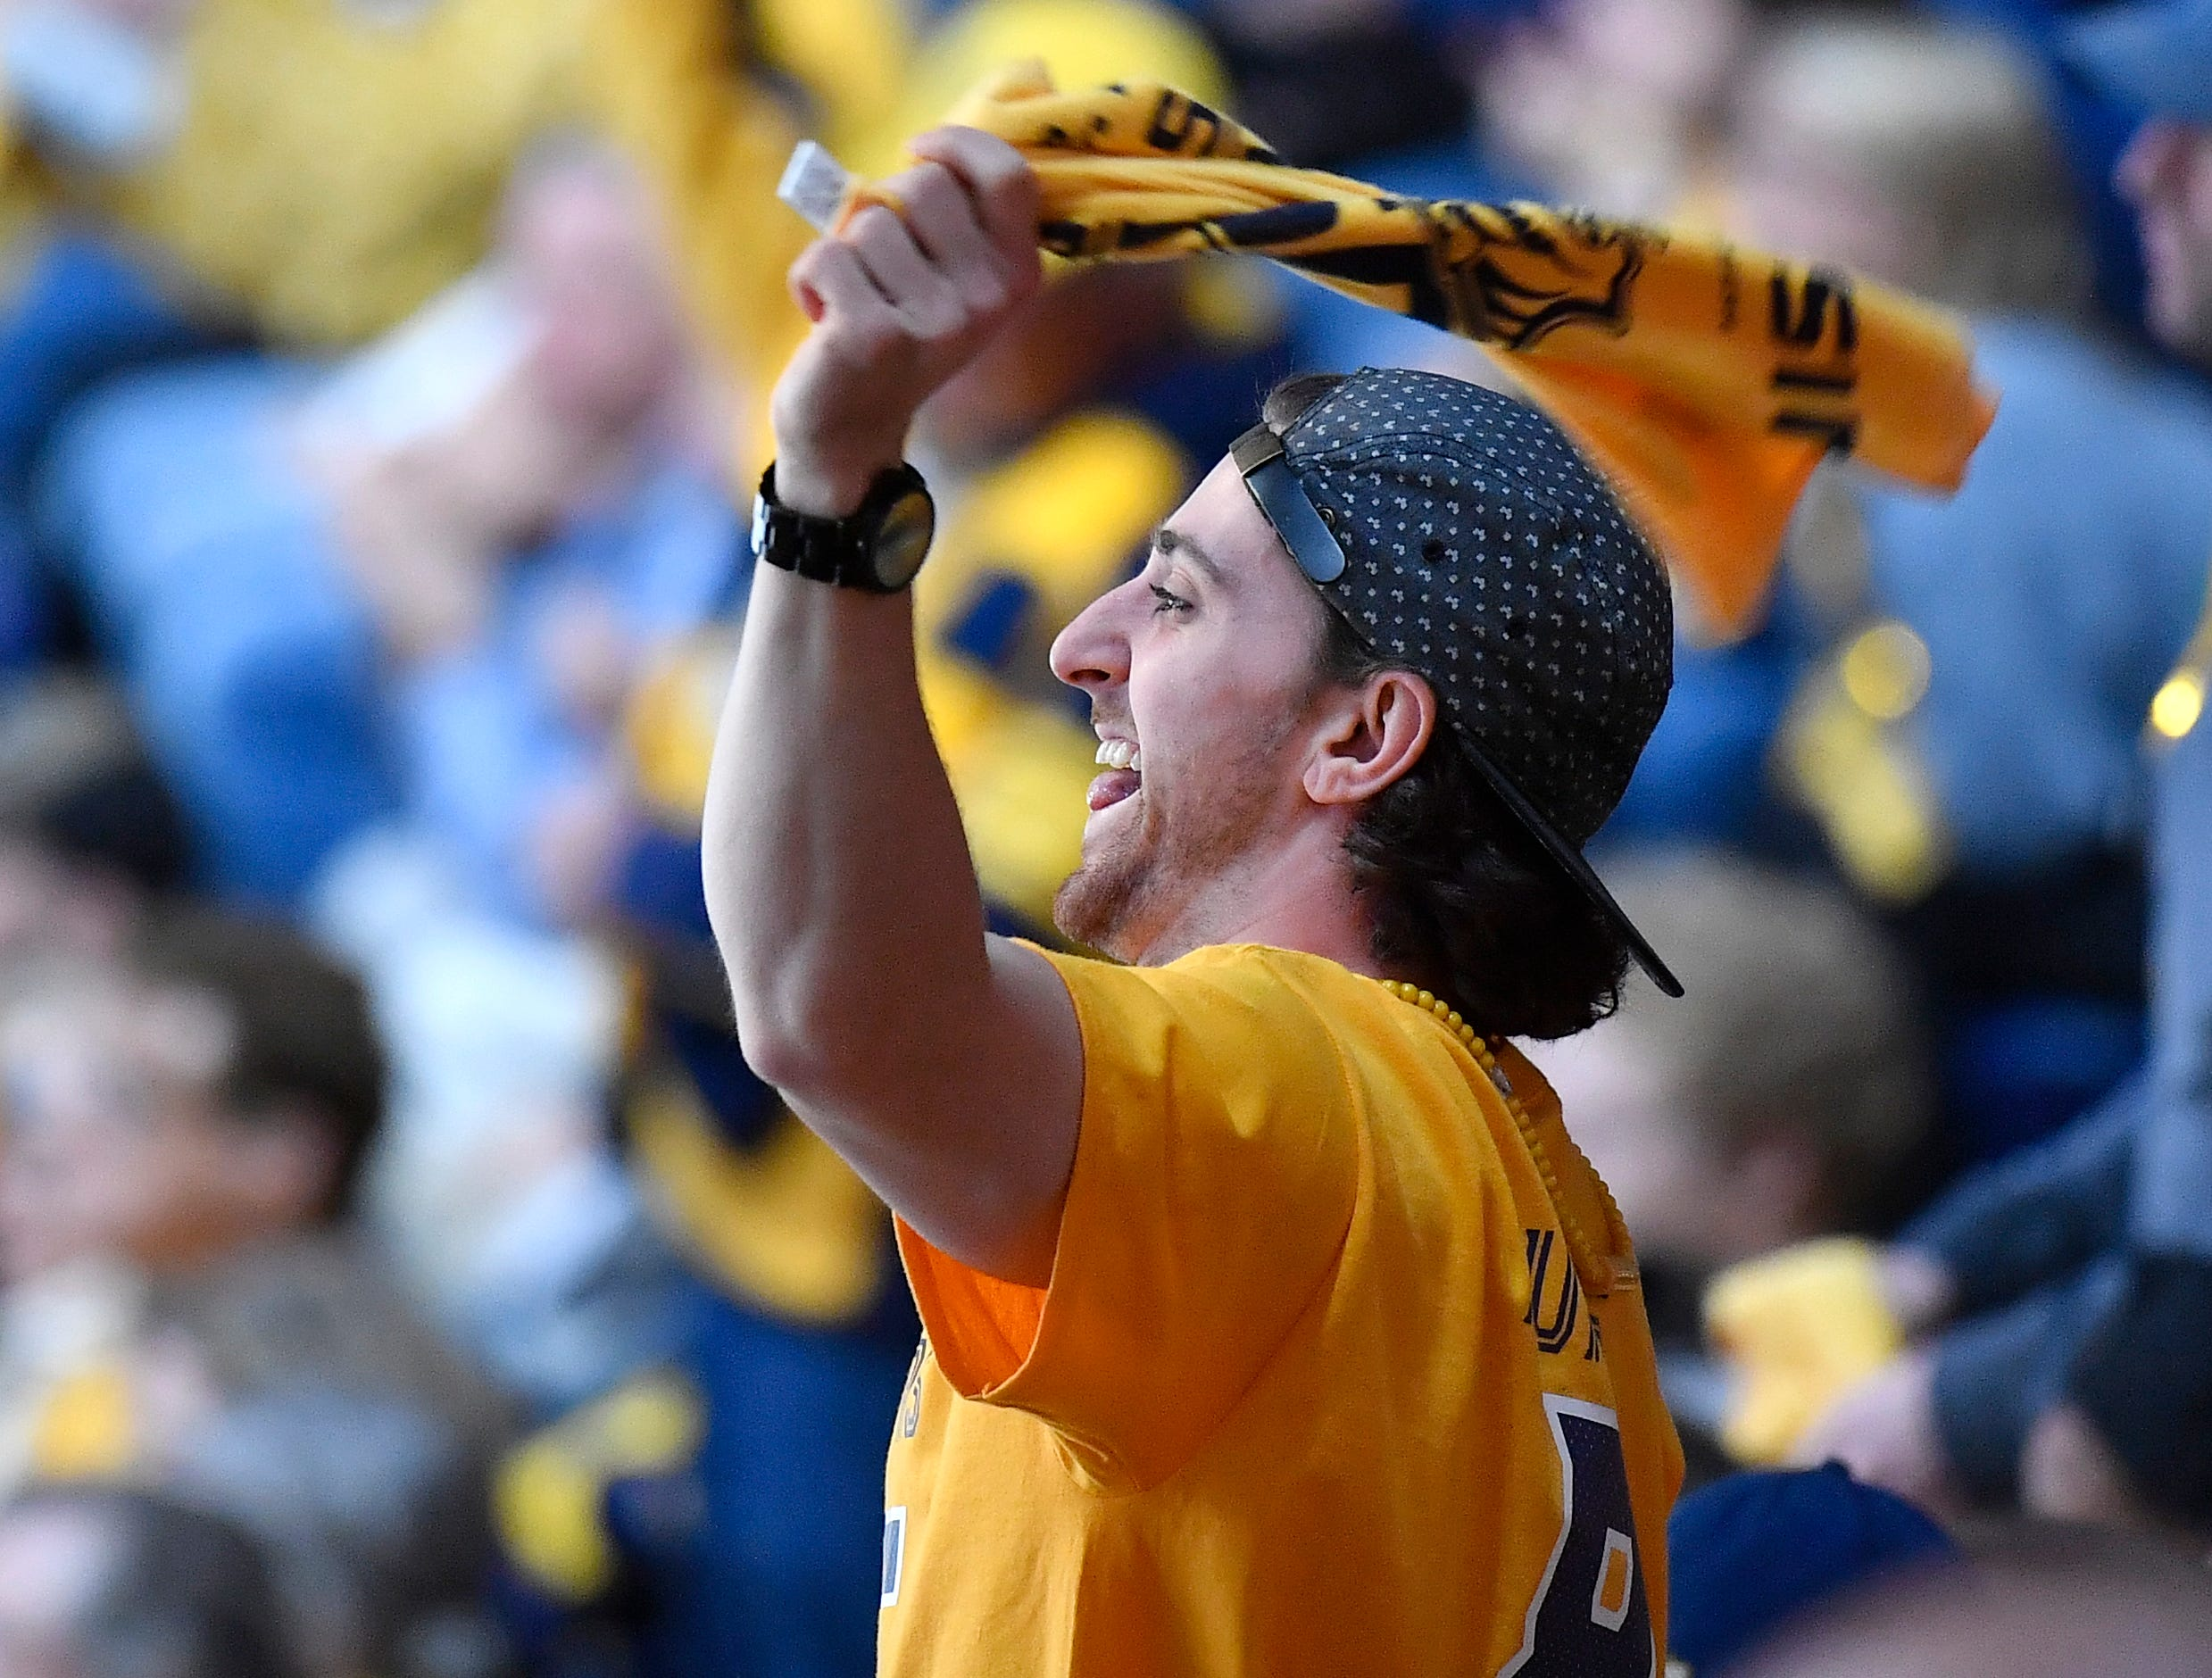 A Predators fan cheers during the third period of the divisional semifinal game at Bridgestone Arena in Nashville, Tenn., Saturday, April 13, 2019.